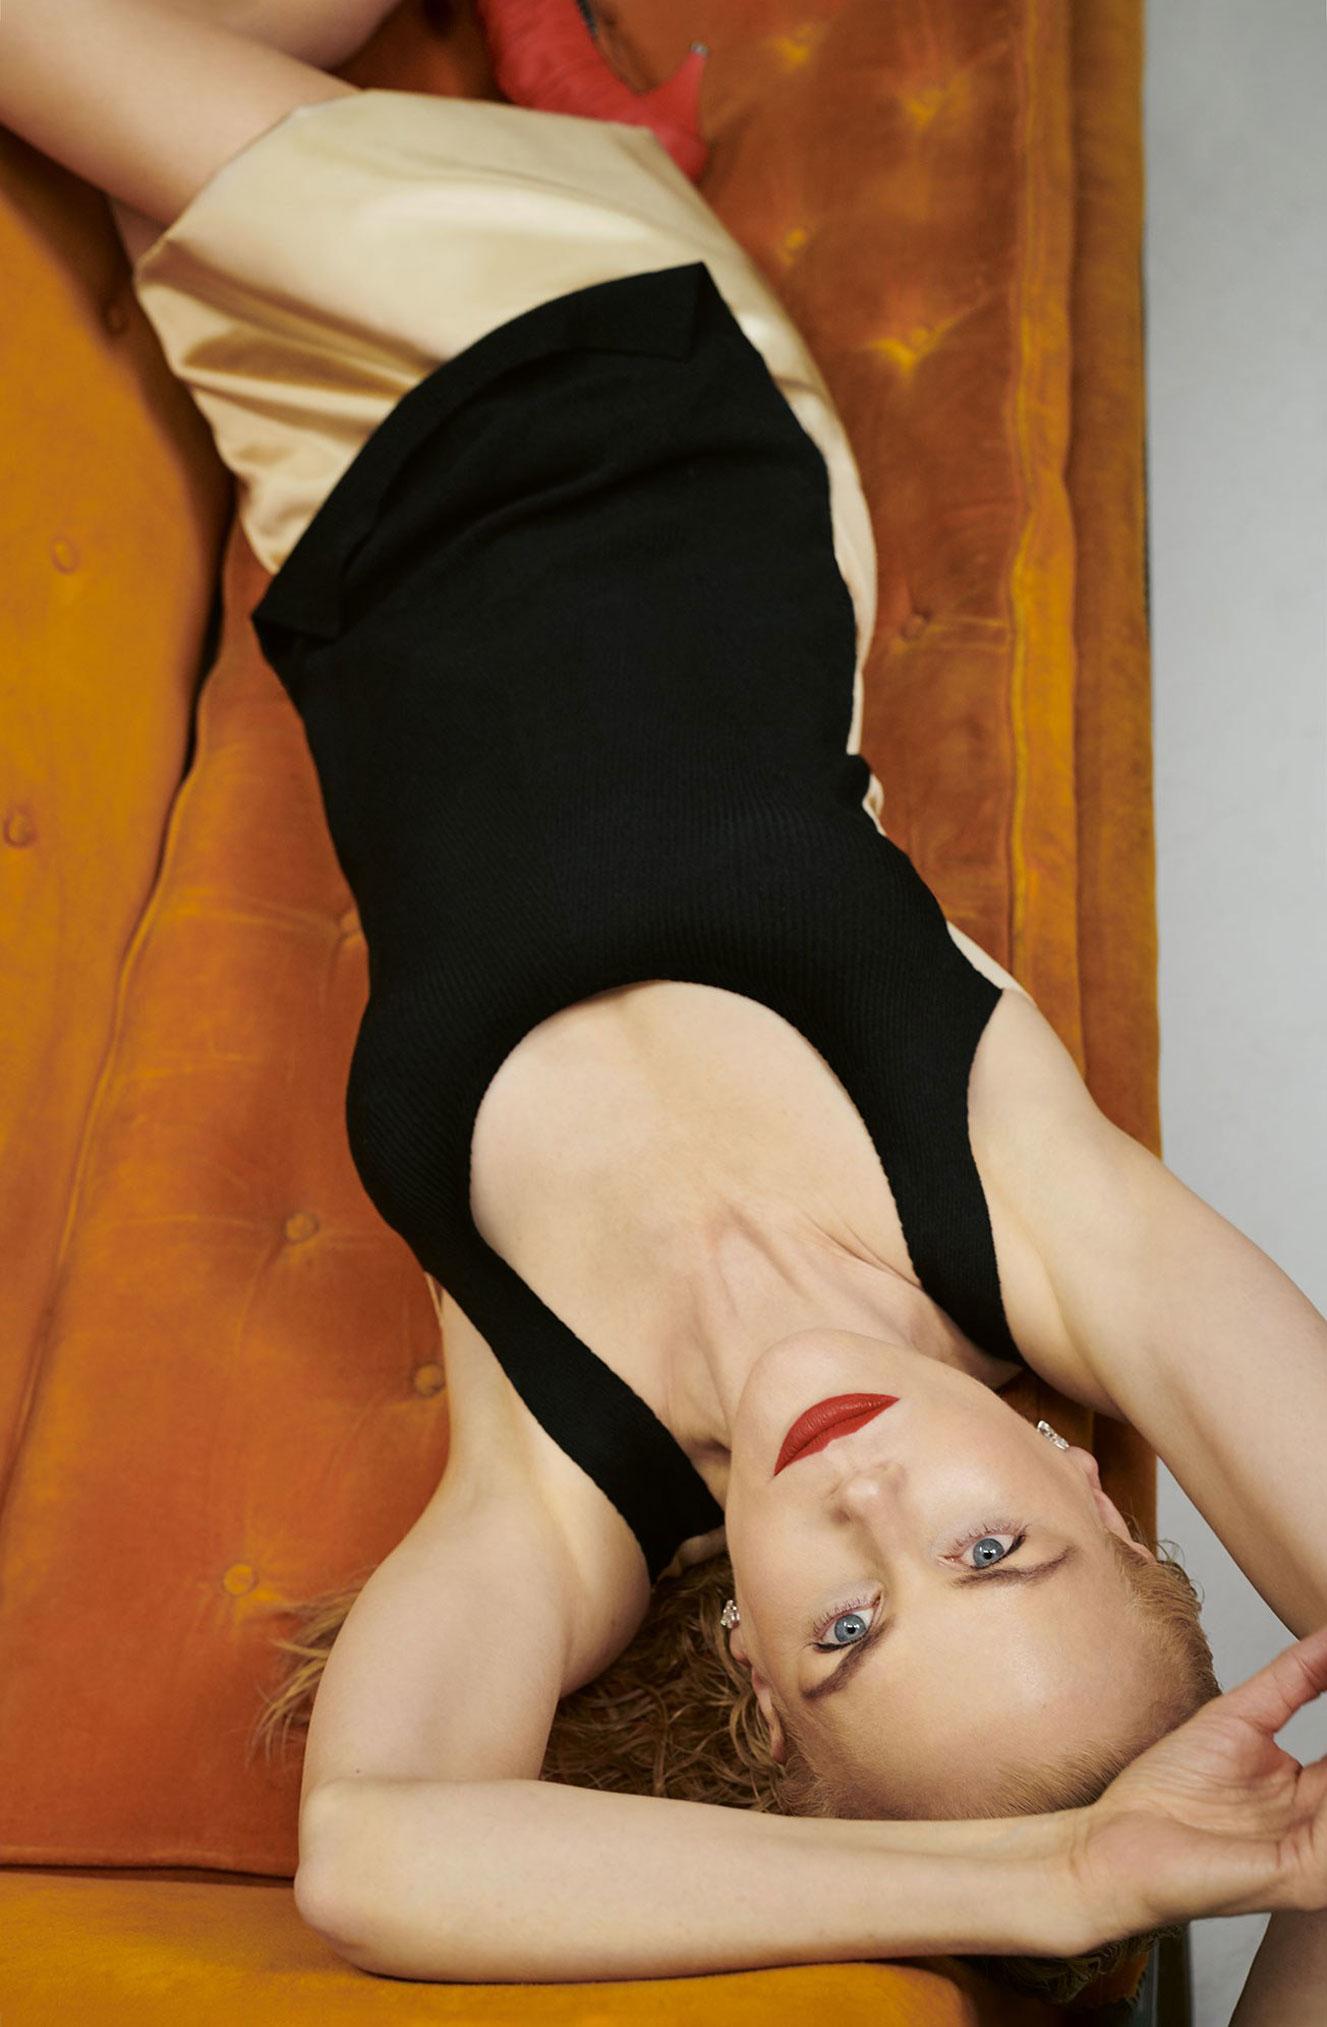 Николь Кидман в журнале Vanity Fair, май 2019 / фото 04